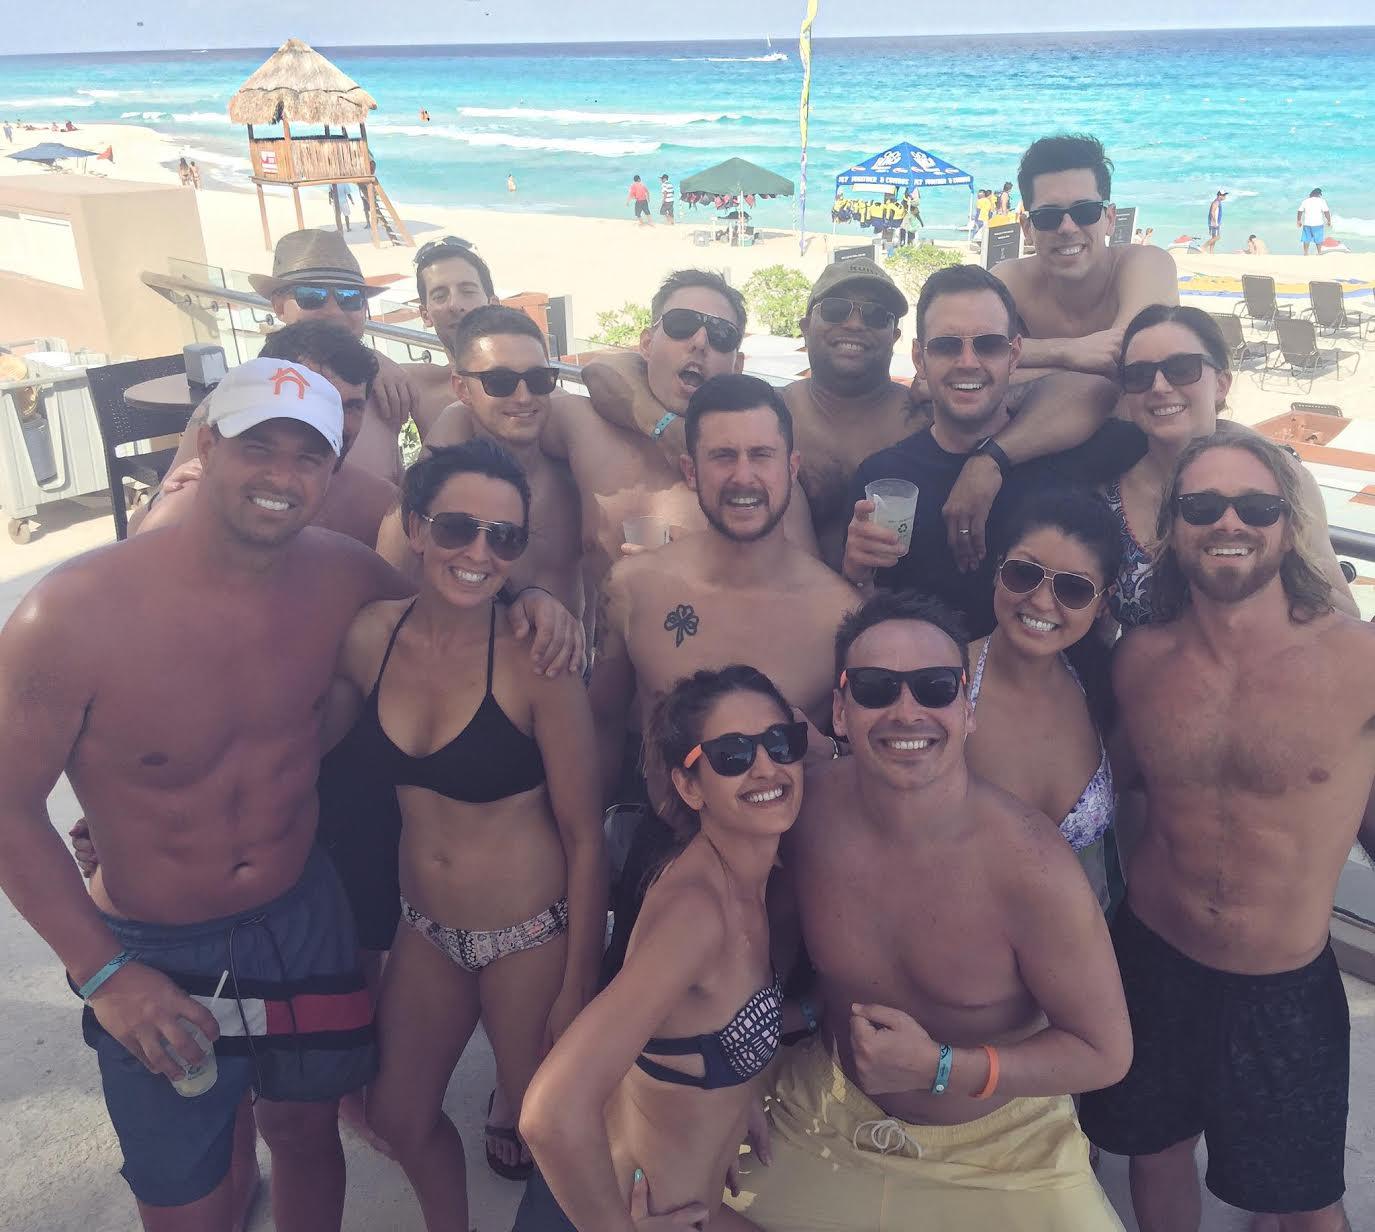 group_at_pool_cancun.jpg